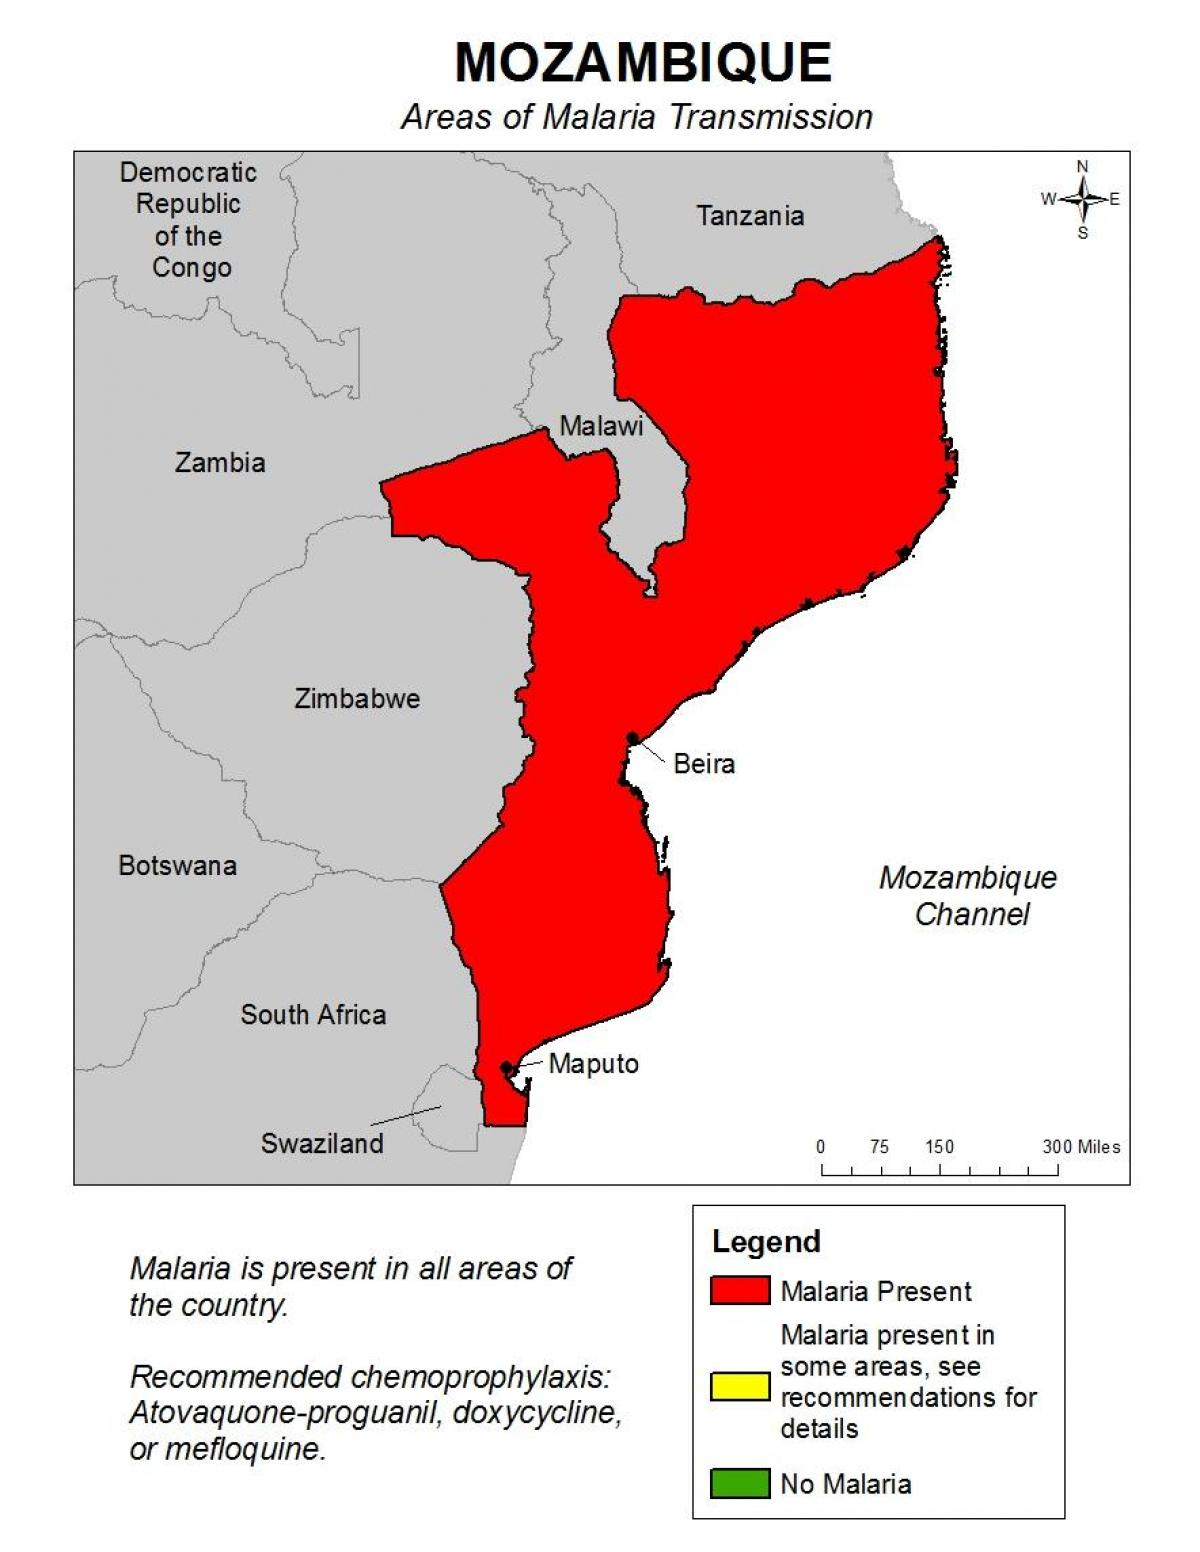 Mosambikin Malaria Kartta Kartta Mosambik Malaria Ita Afrikka